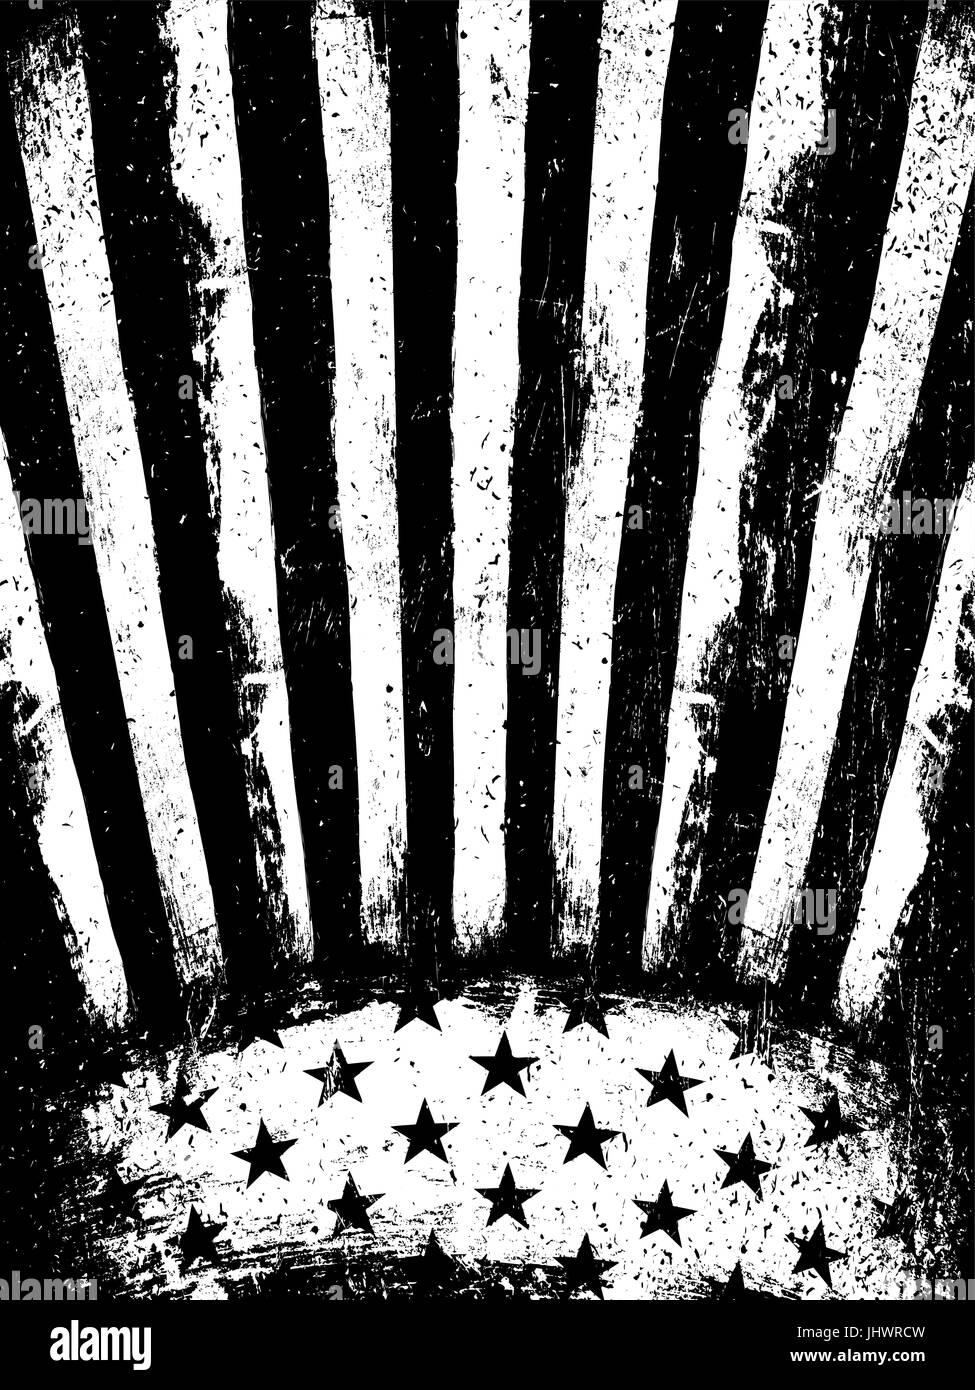 monochrome negative photocopy american flag background grunge aged